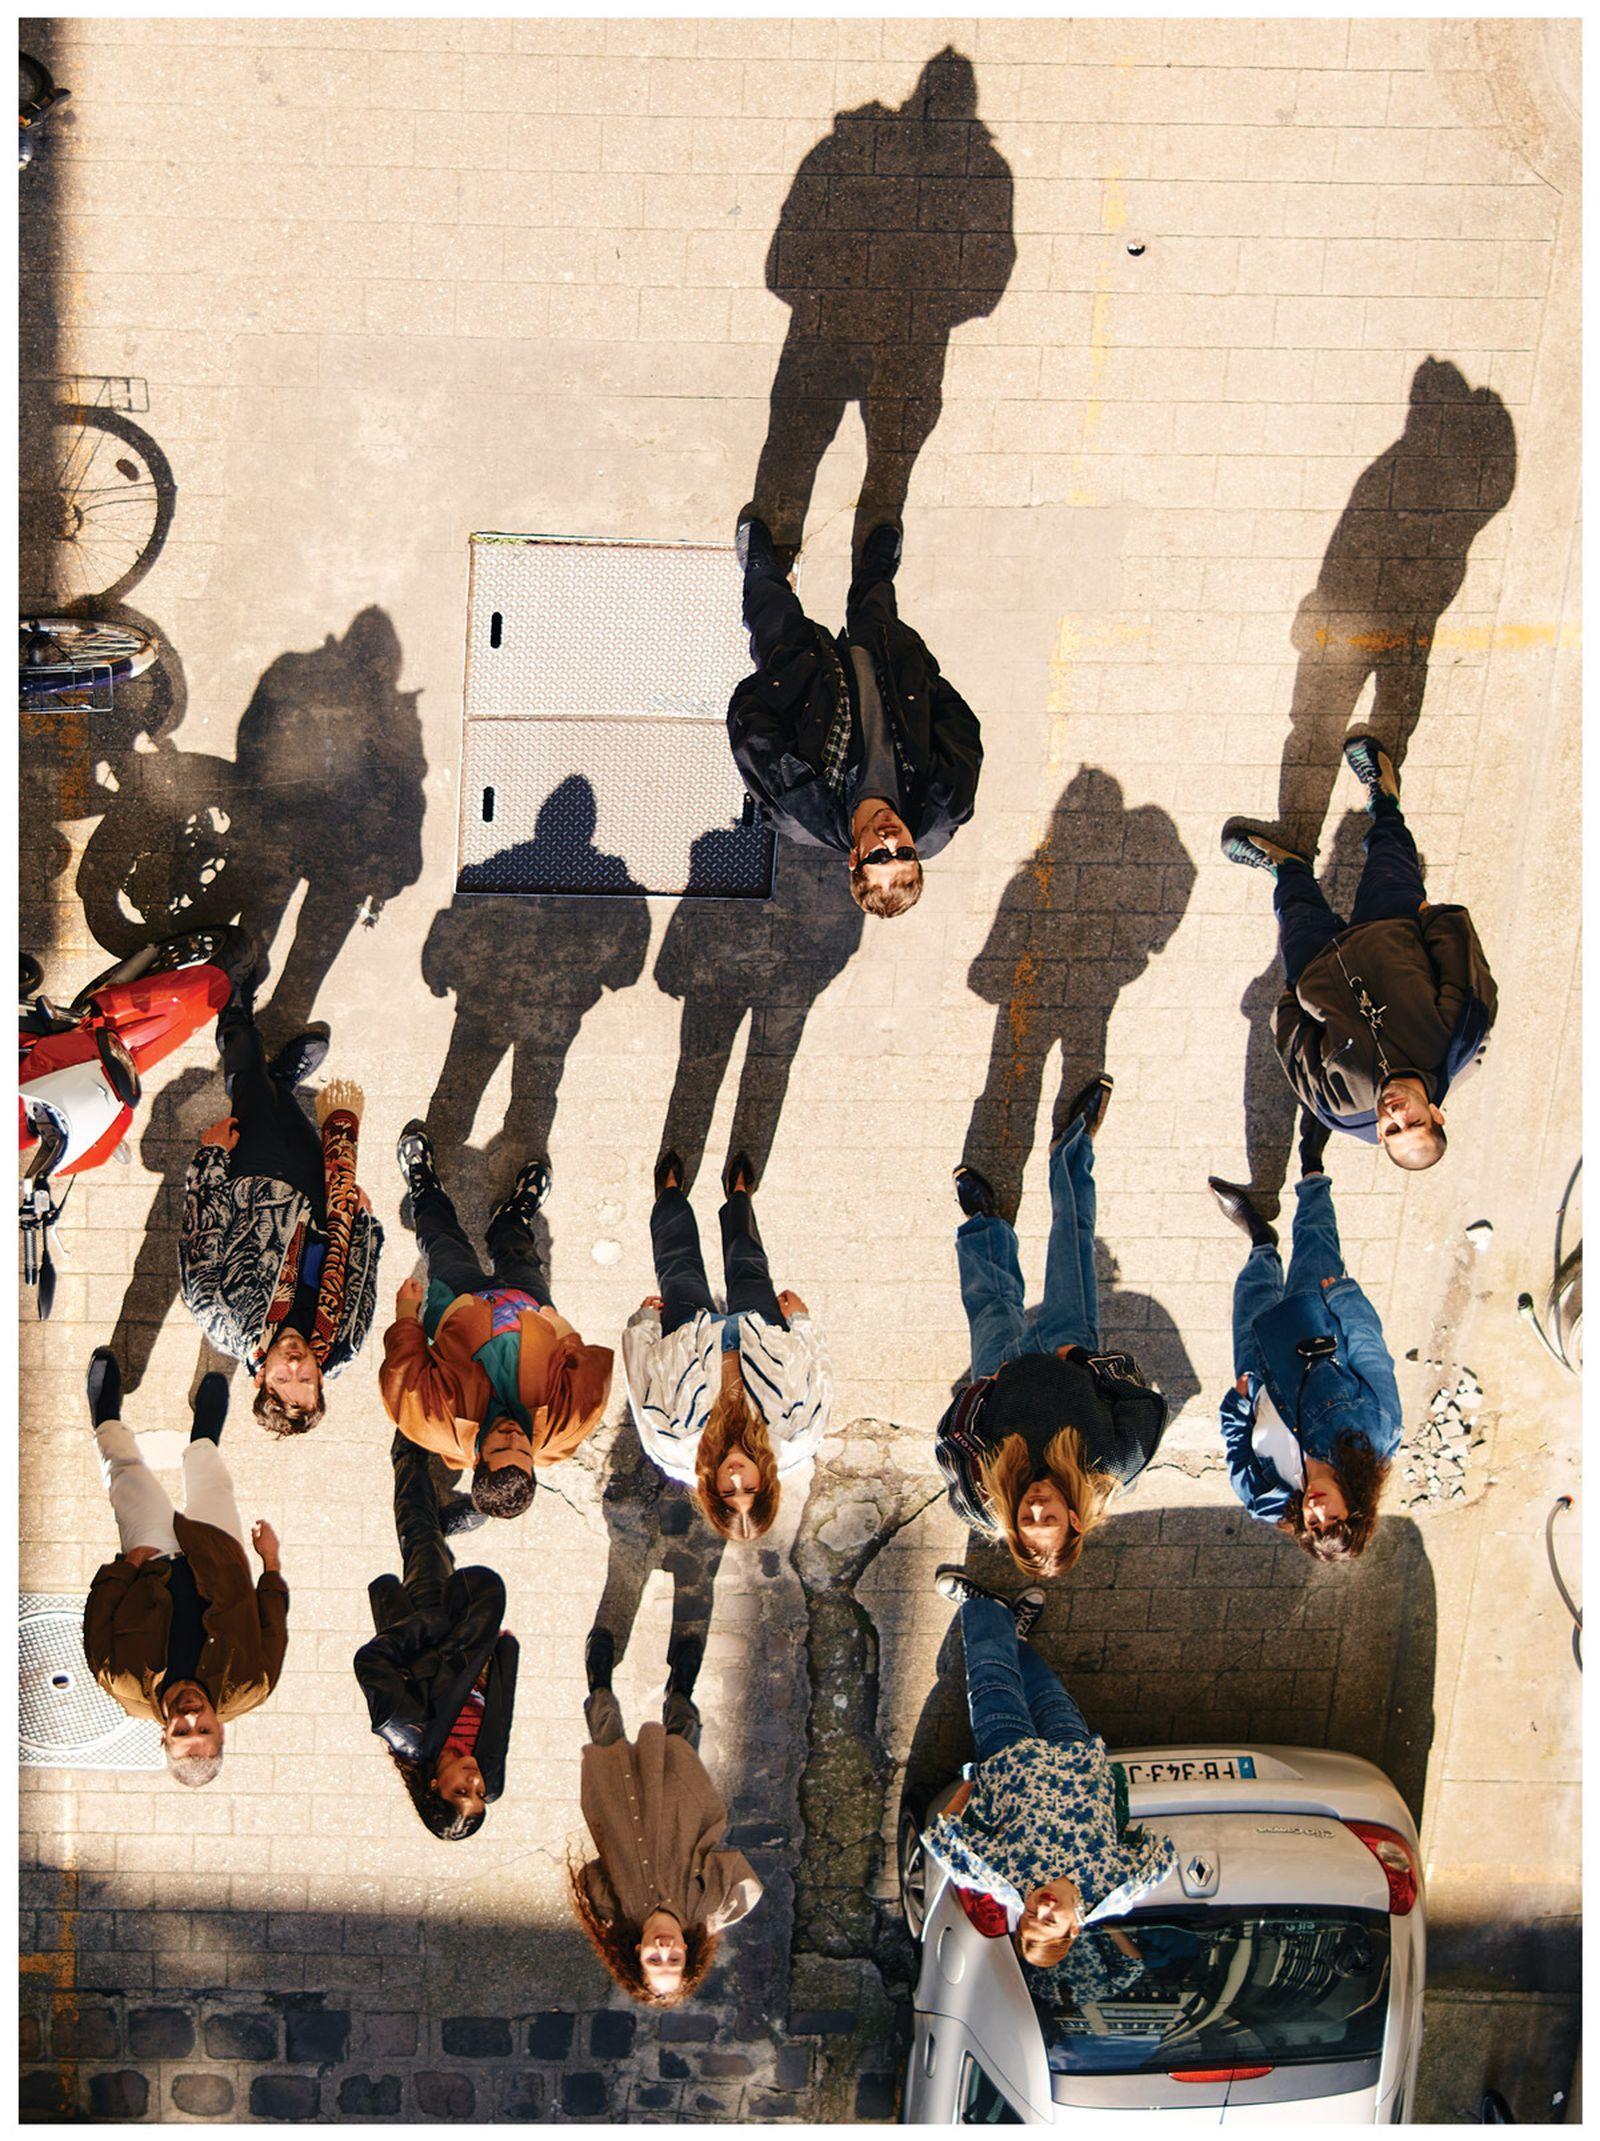 meet-yproject-friends-02